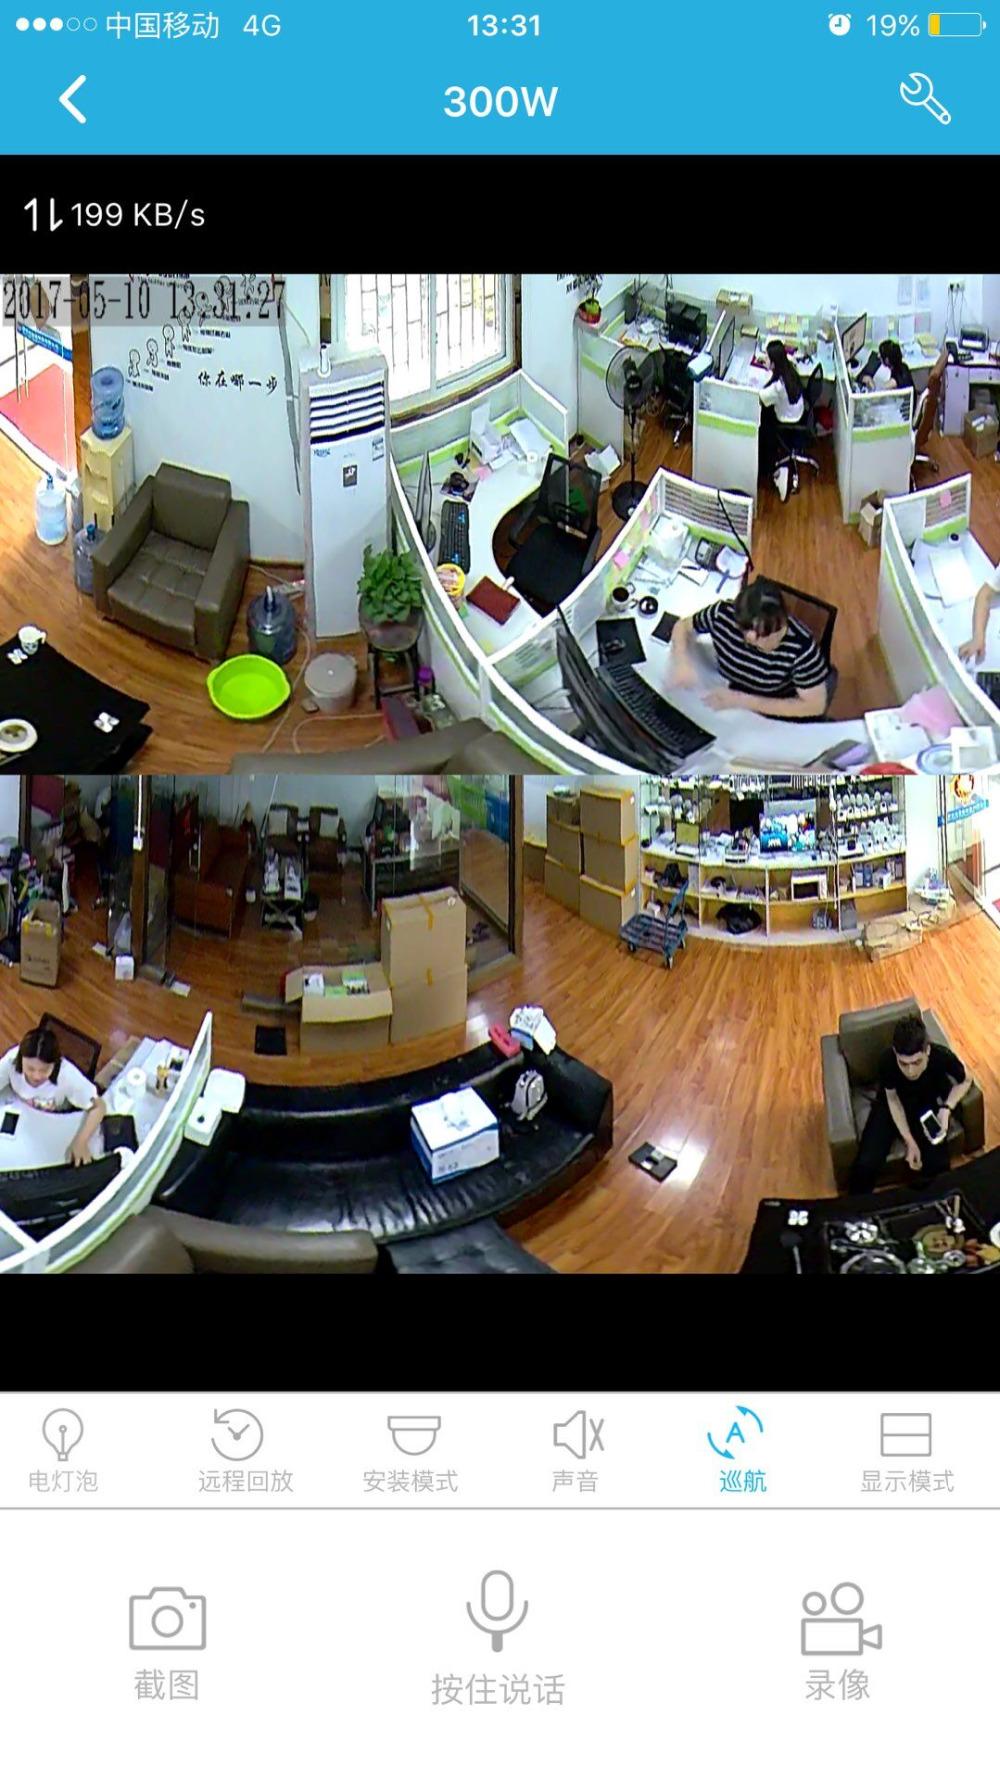 360 camera two screen